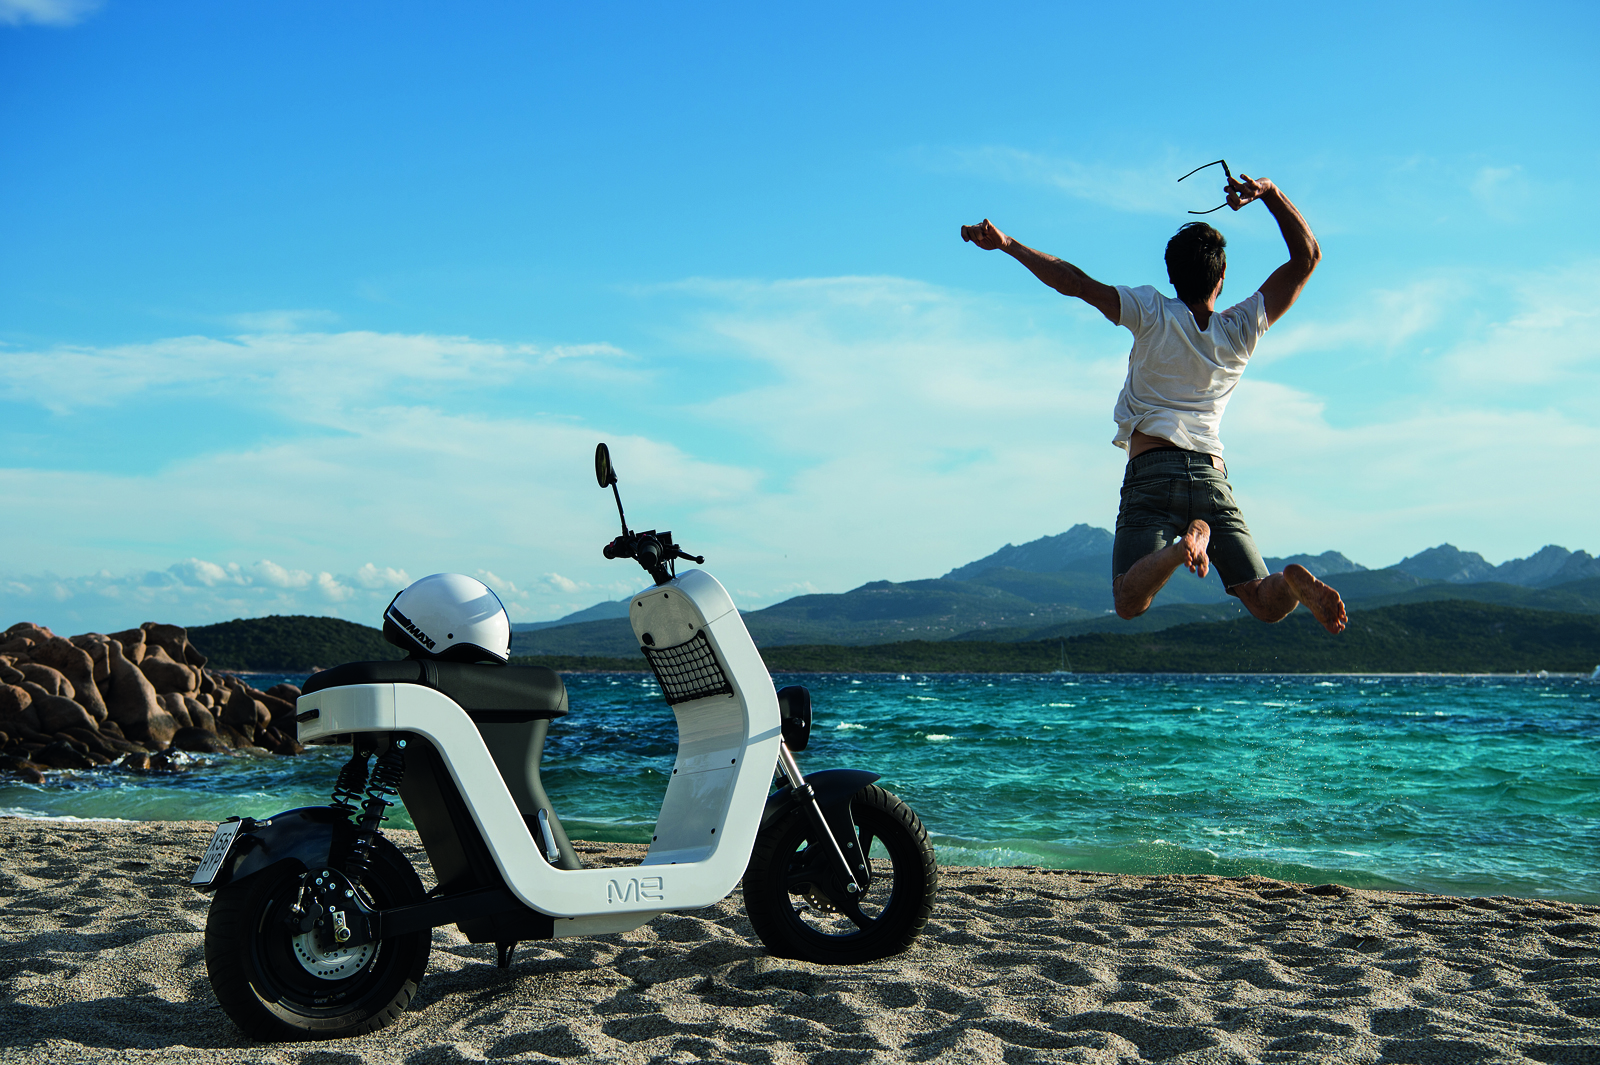 Sissi Moto Crema Usato me 2.5 – 🛵 elektrisk moped 2020